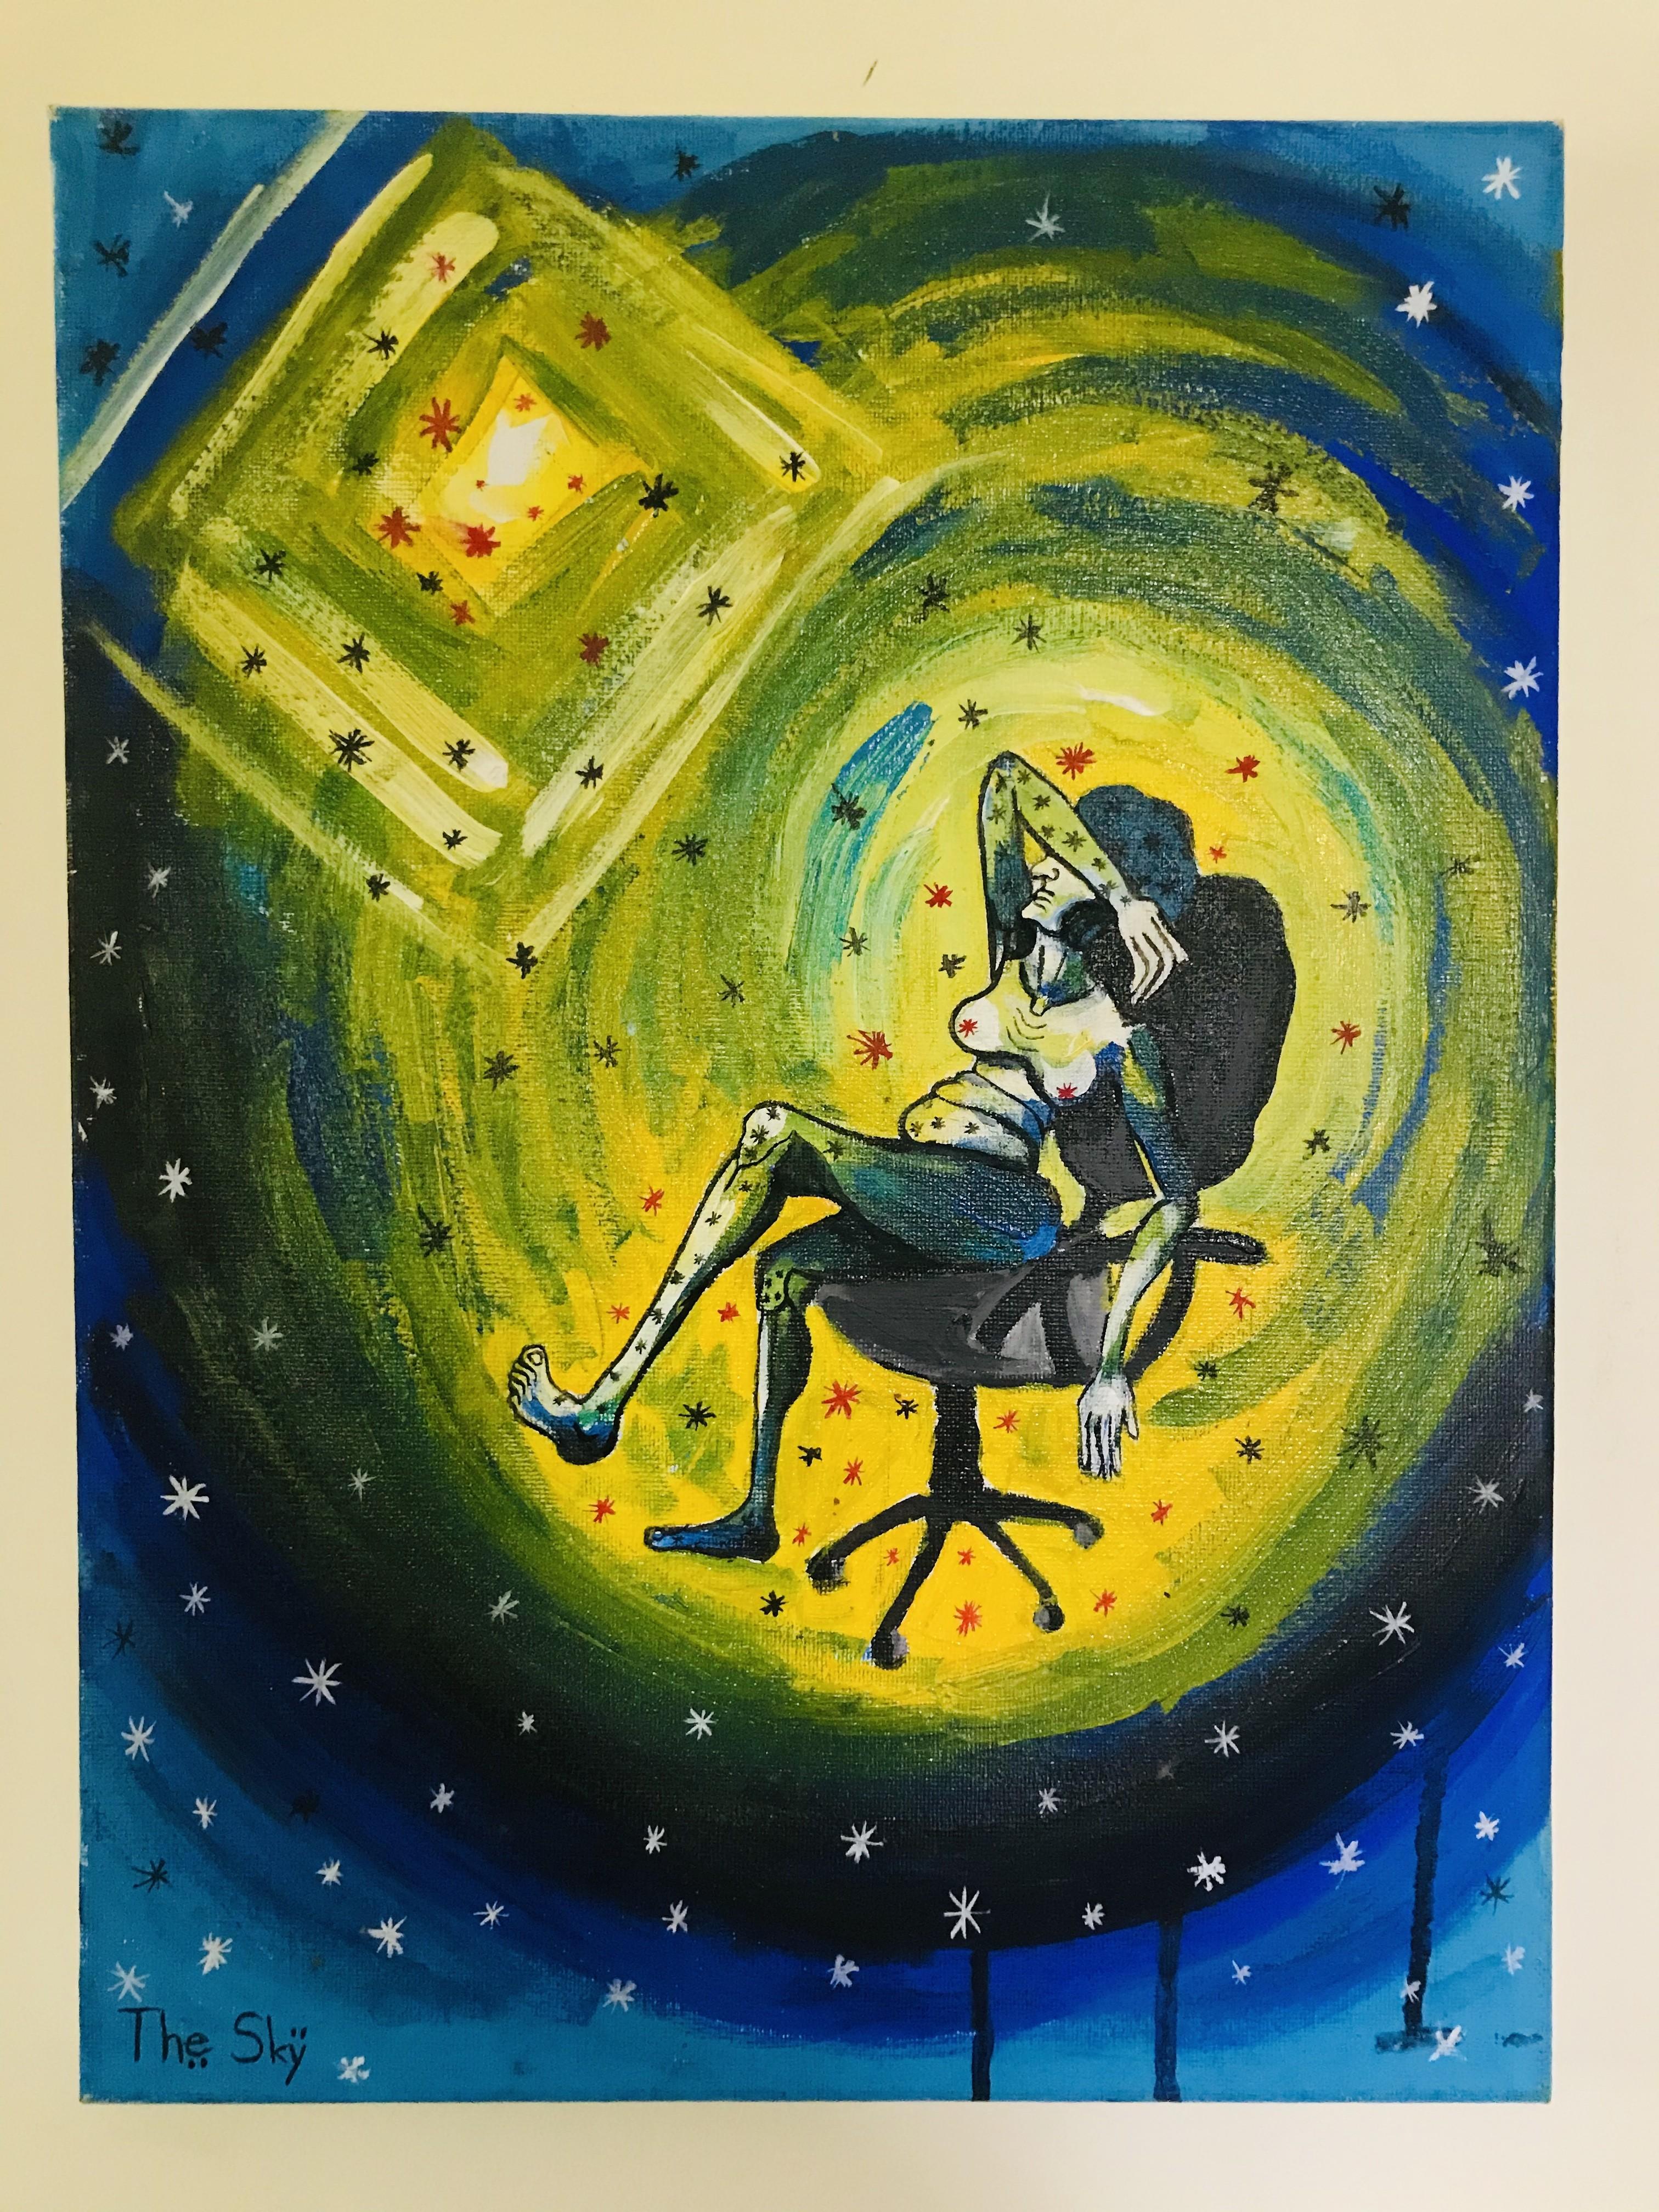 """The Sky"" by Sanduni Bandara"